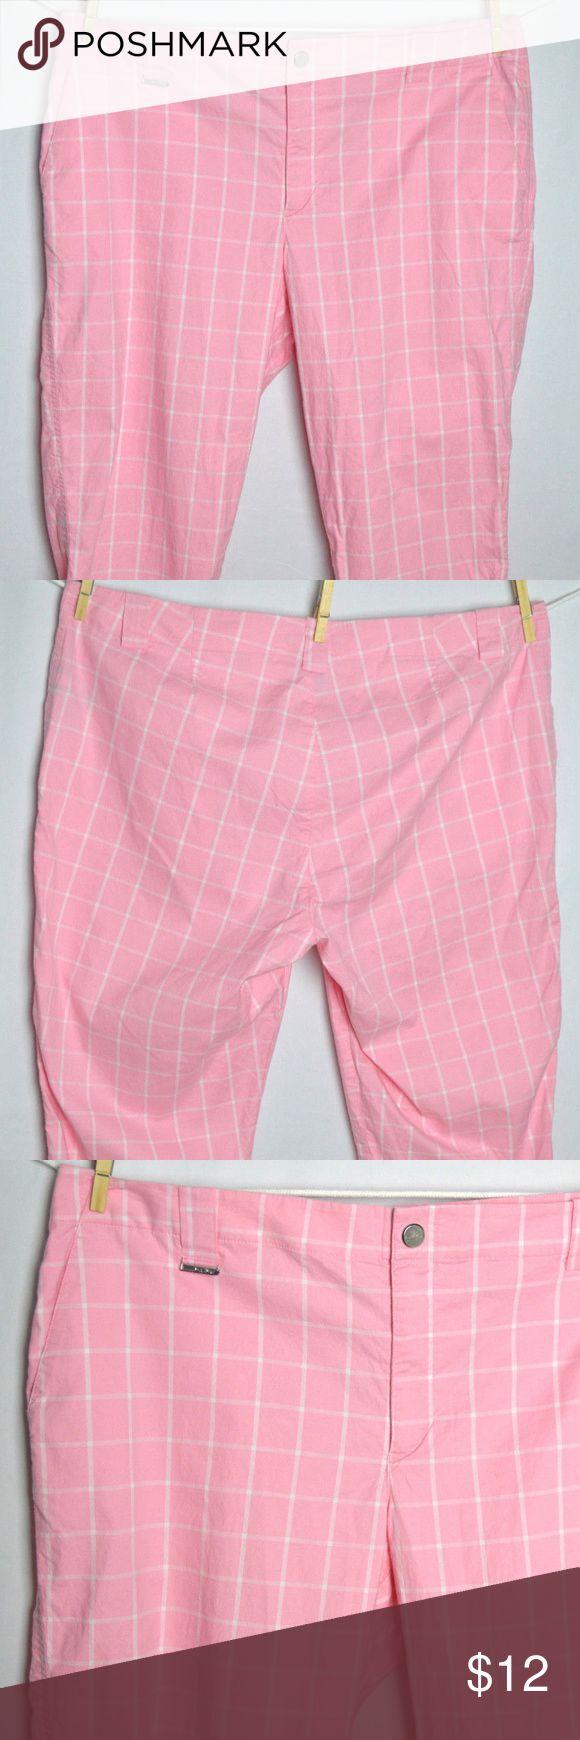 "Ralph Lauren pink golf capri pants size 16 A pair of excellent used condition Ralph Lauren capri golf pants. Size 16, in pink.  Dimensions:-  Waist:- 39"" (19.5"" across) Hips:- 22"" Length:- 31"" Inseam:- 21"" Cuff:- 9.5""  Thanks for viewing! Ralph Lauren Pants Capris"